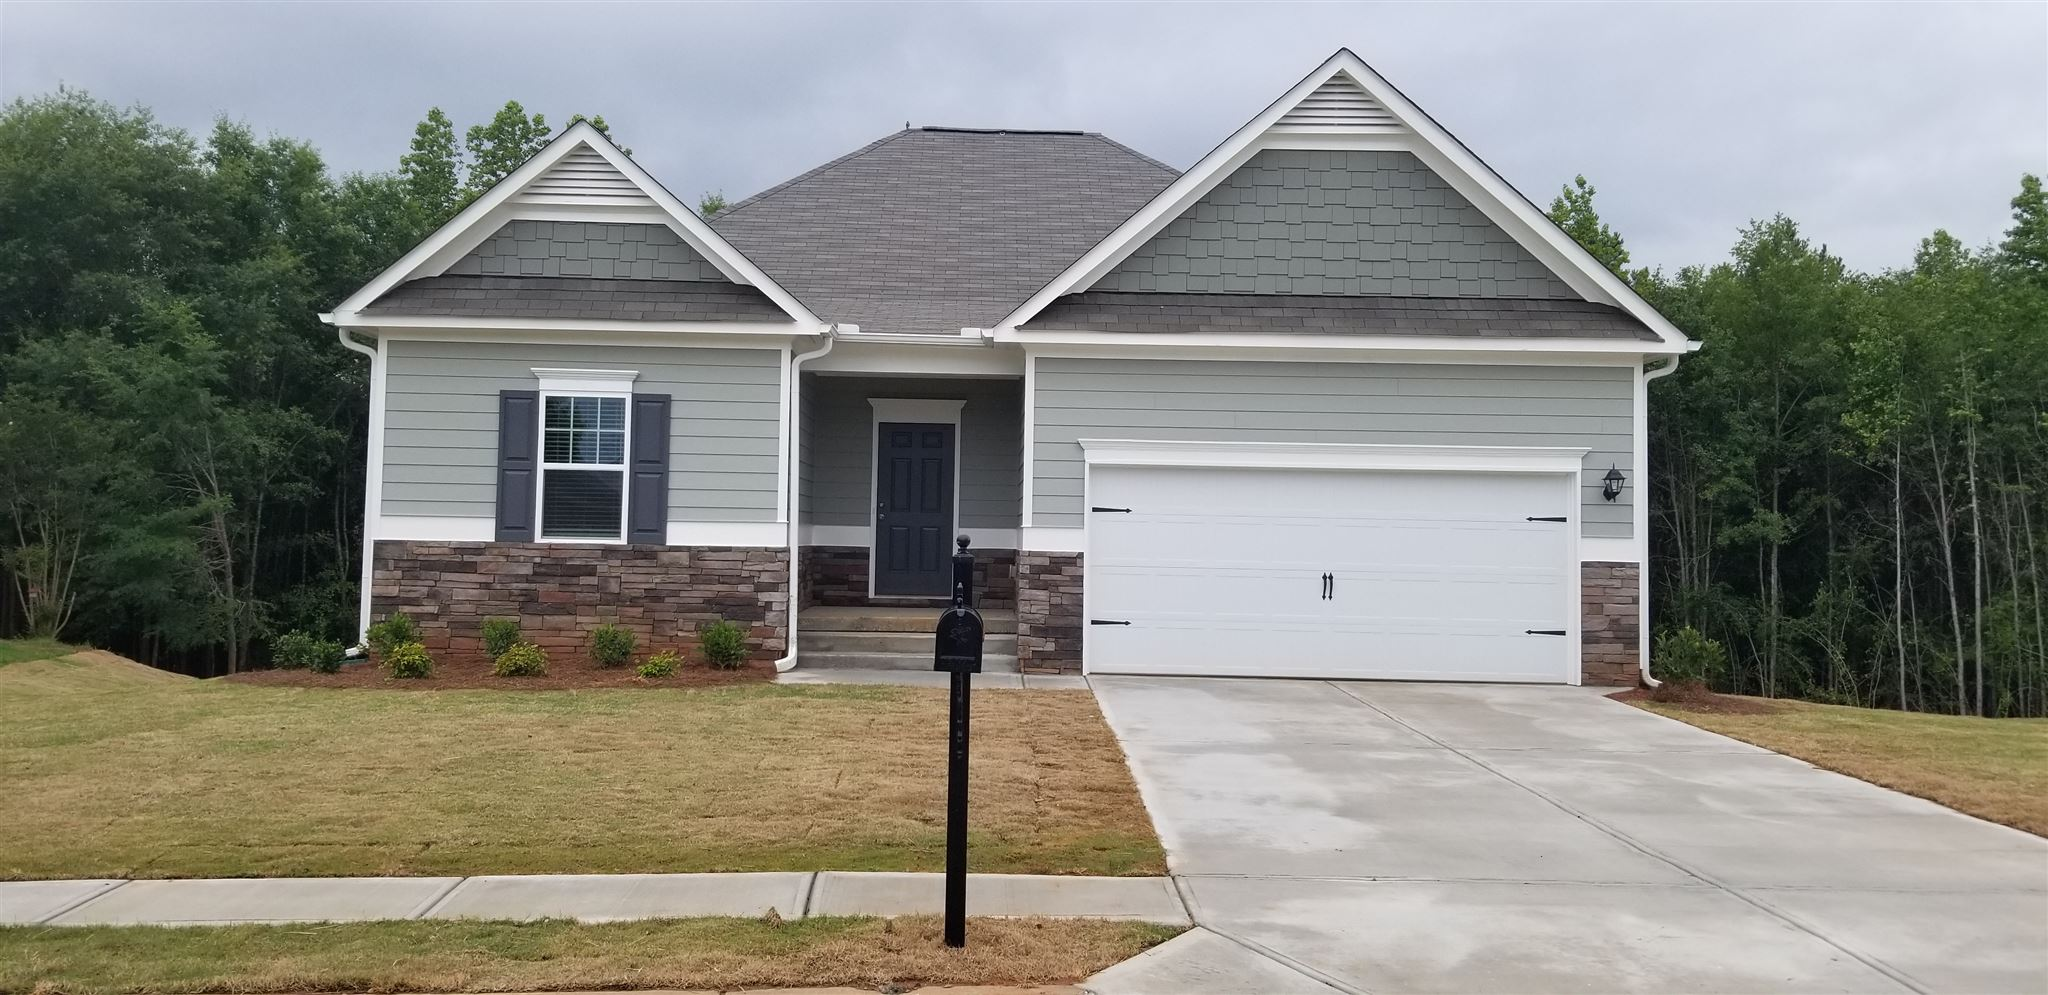 117 MEGAN COURT, Lake Oconee in Putnam County, GA 31024 Home for Sale